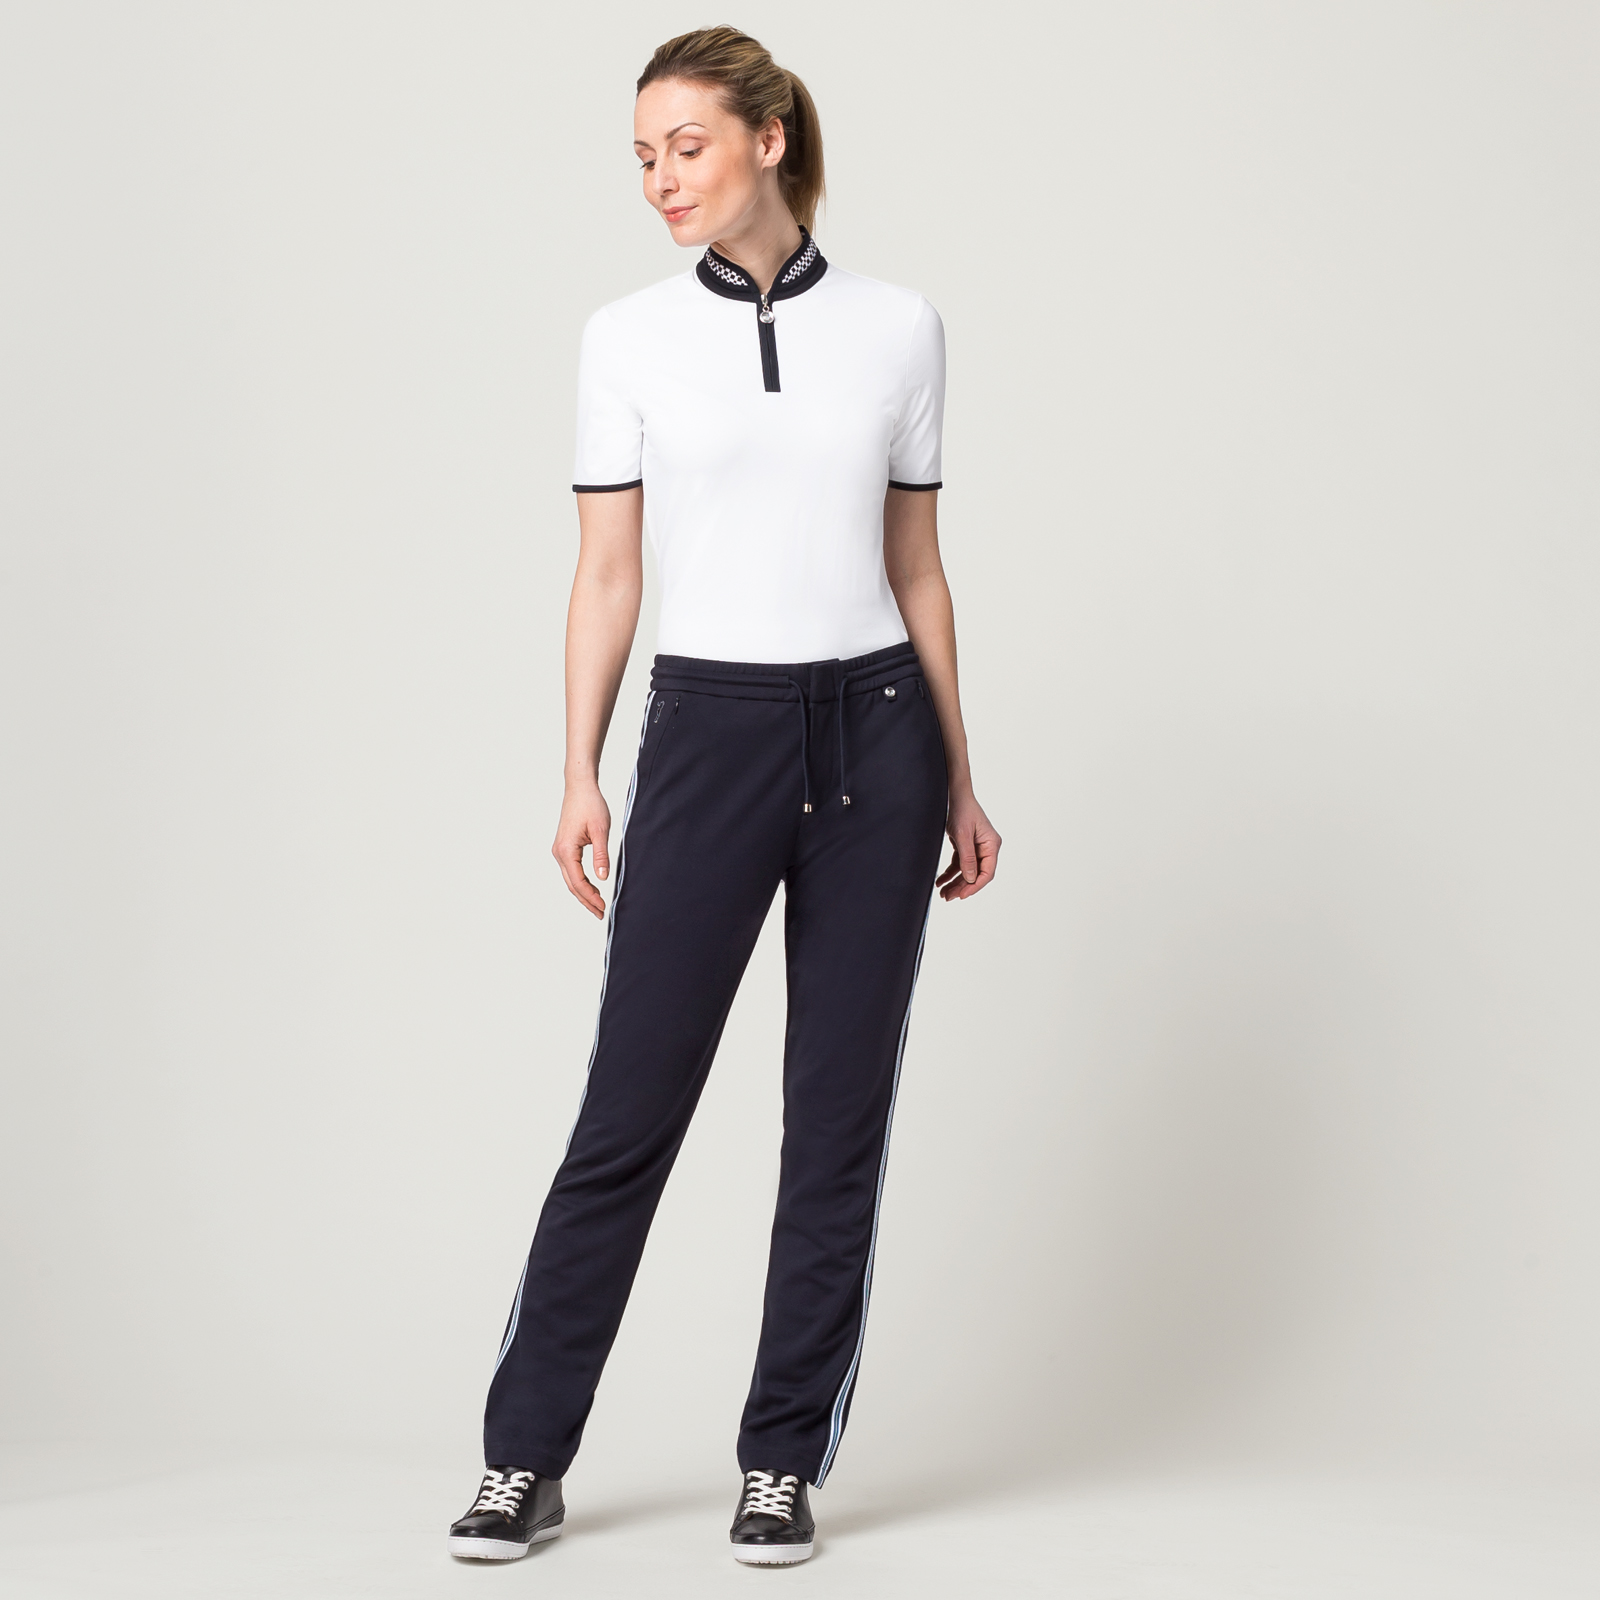 Damen Golfhose mit Extra Stretch Komfort in Regular Fit